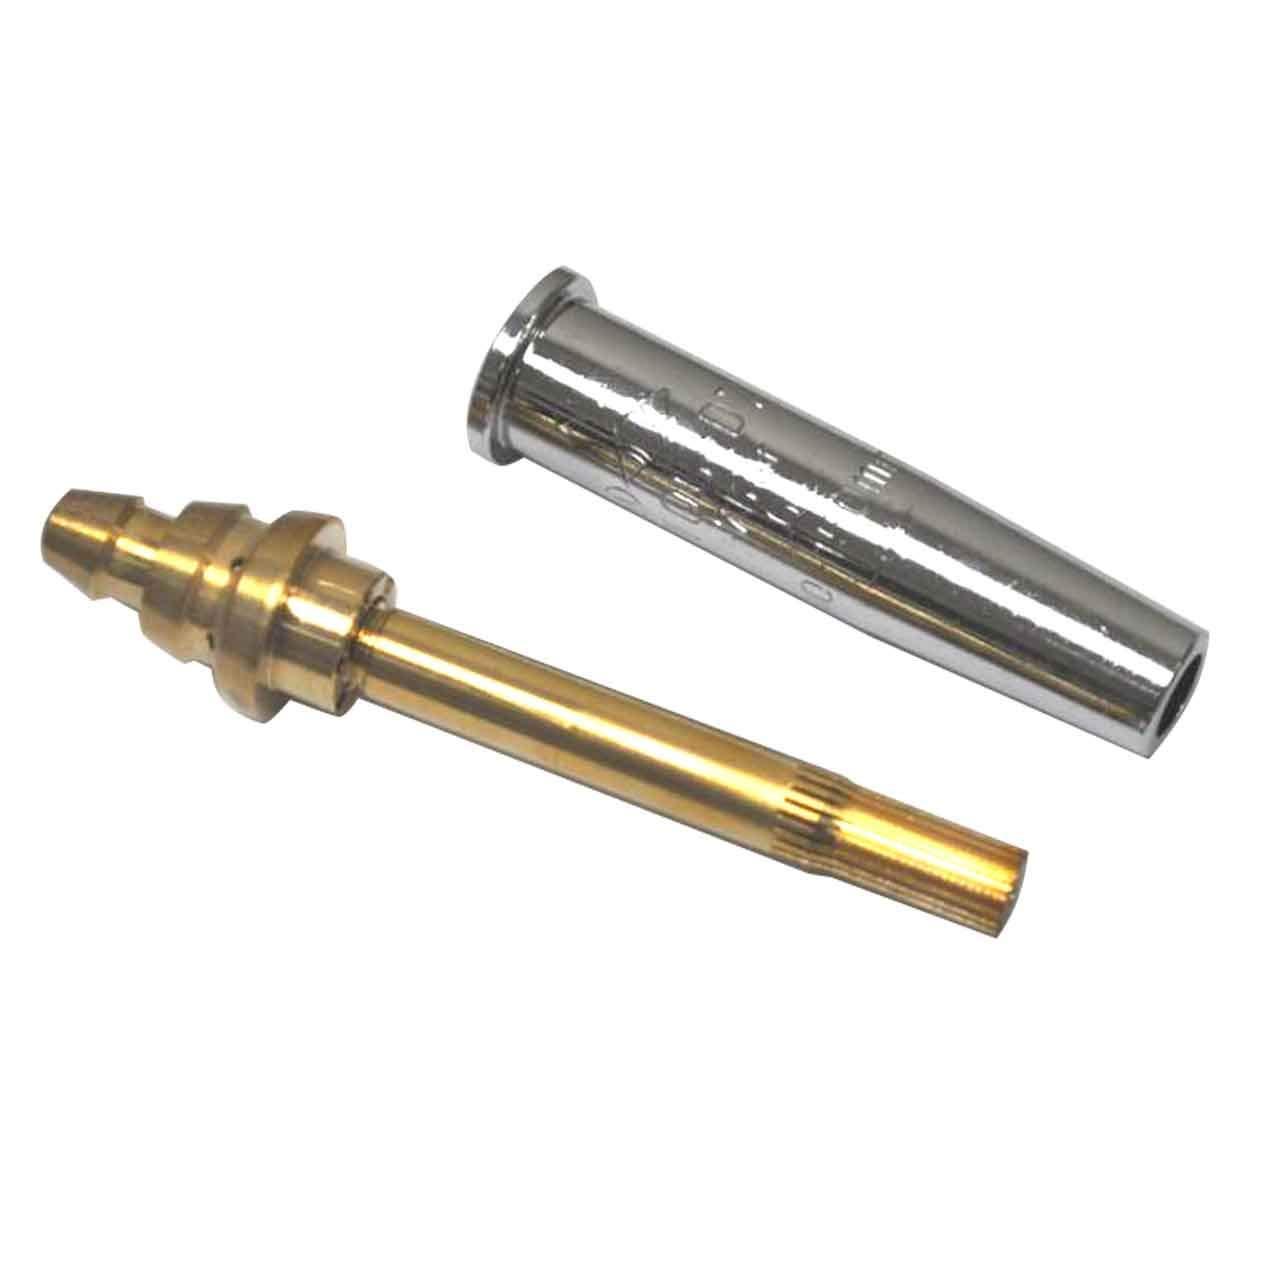 Koike 106D7 Propane Cutting Tip Size 3